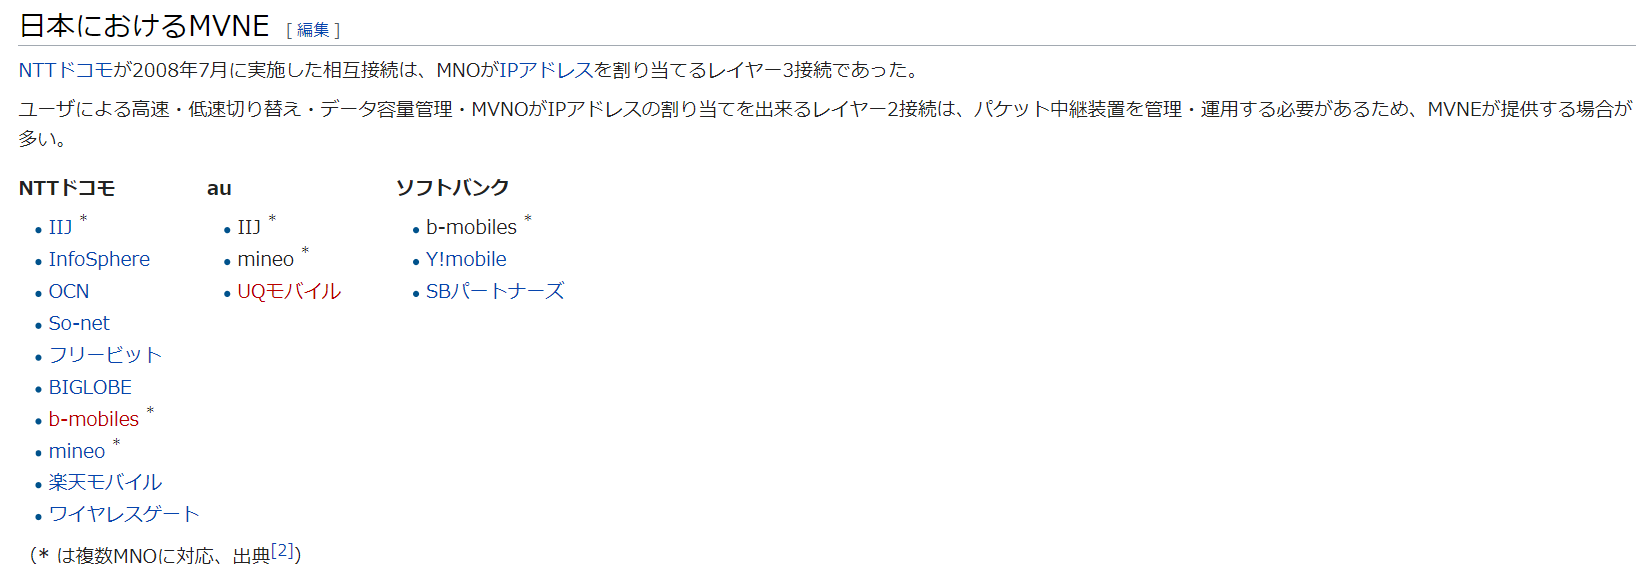 WikipediaMVNE